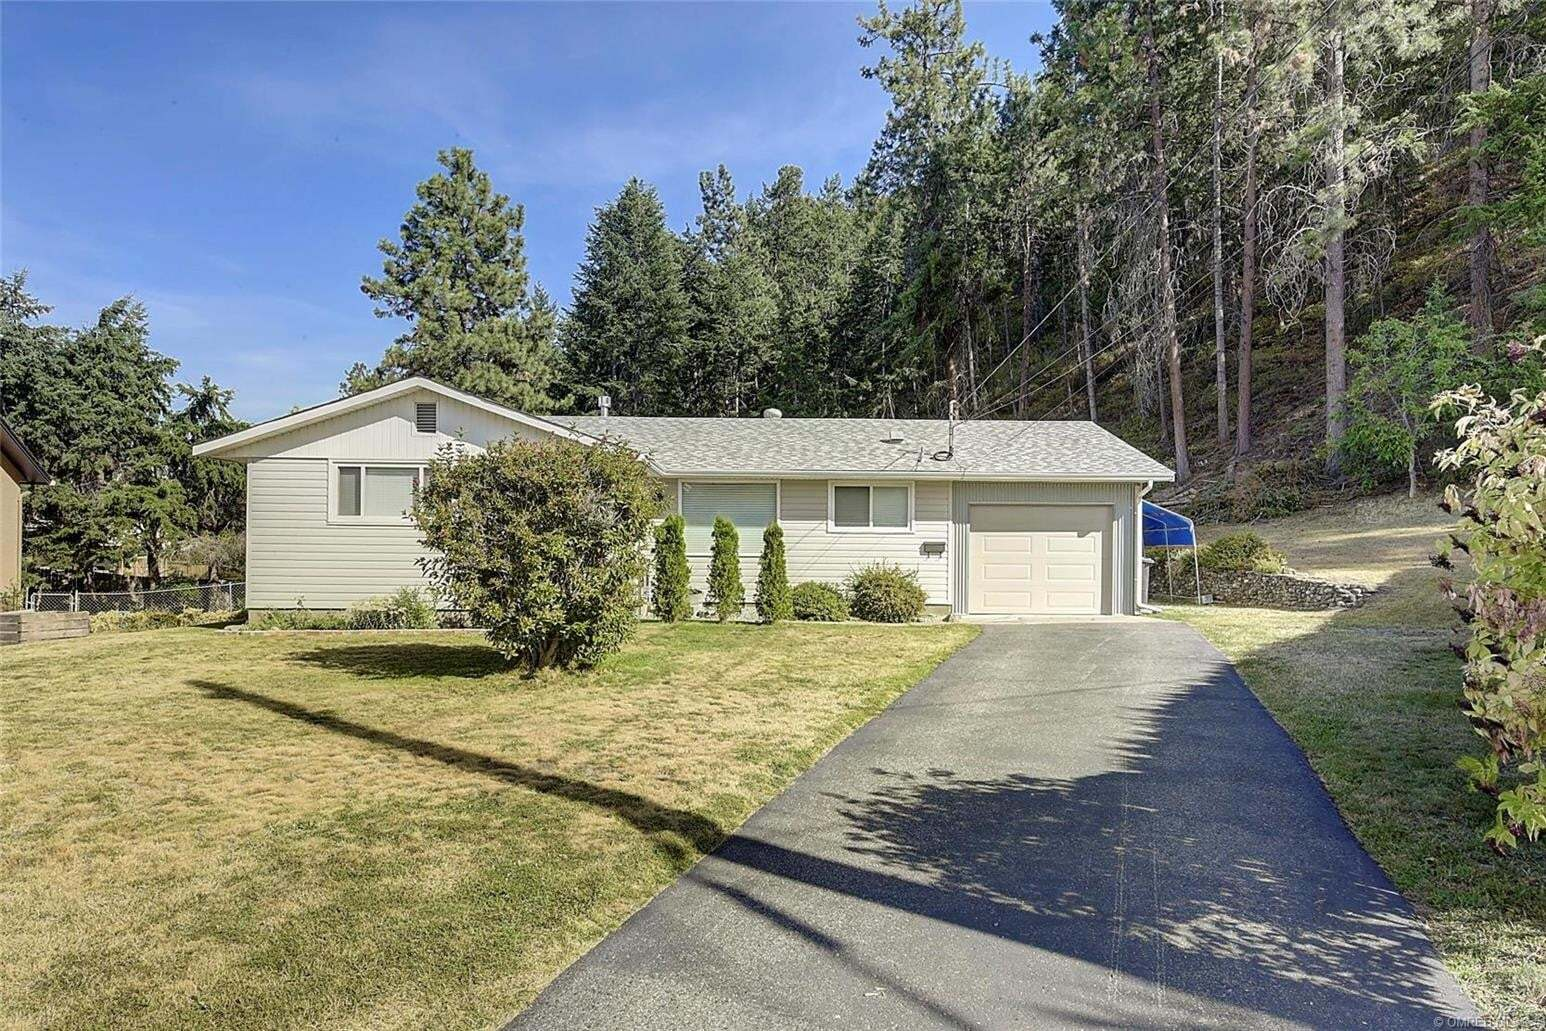 House for sale at 1309 Ponderosa Rd West Kelowna British Columbia - MLS: 10214270